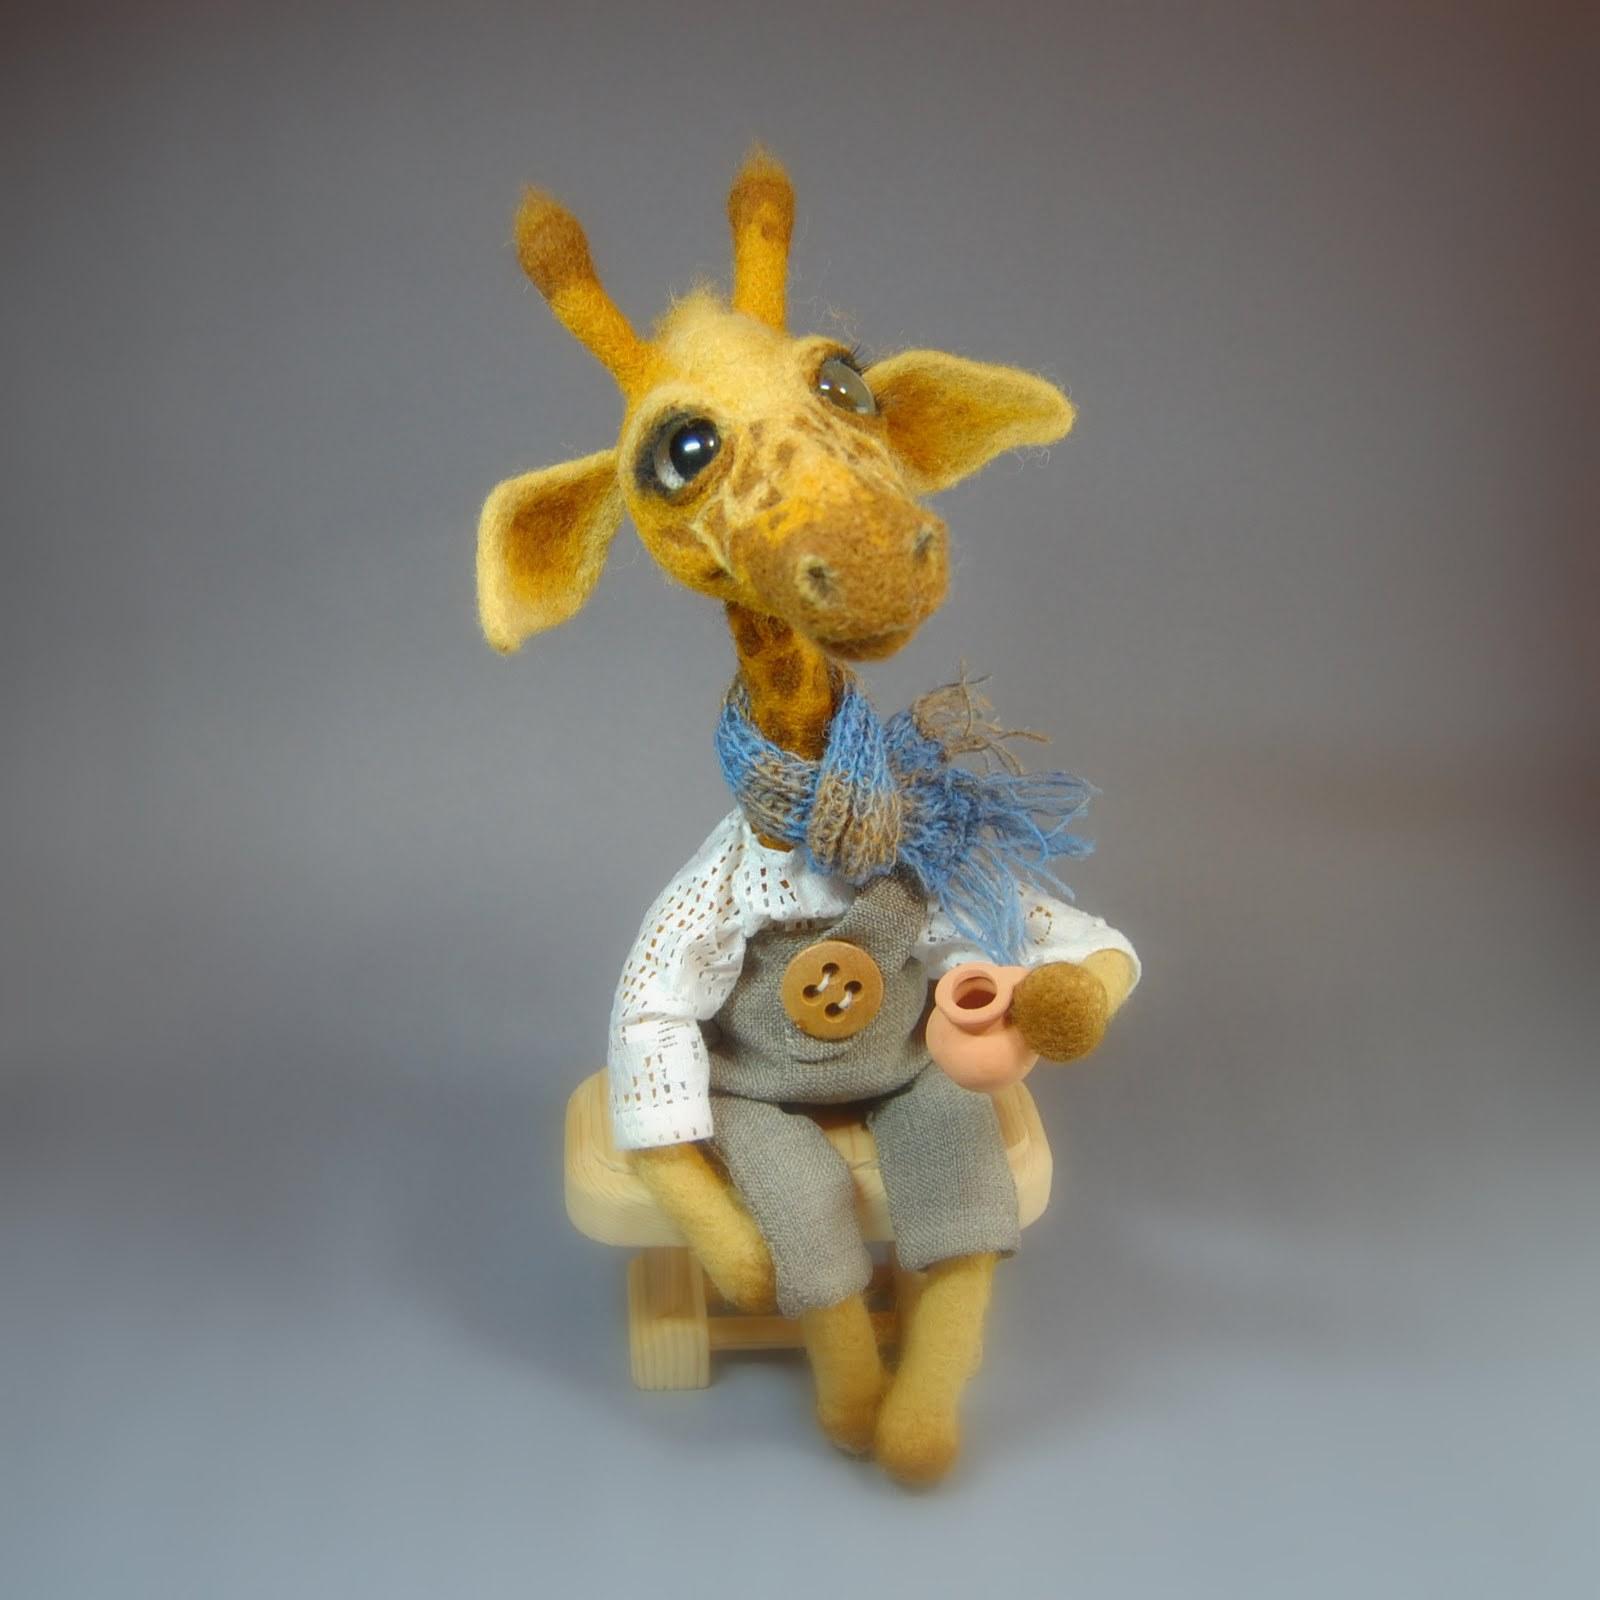 Honey Giraffe